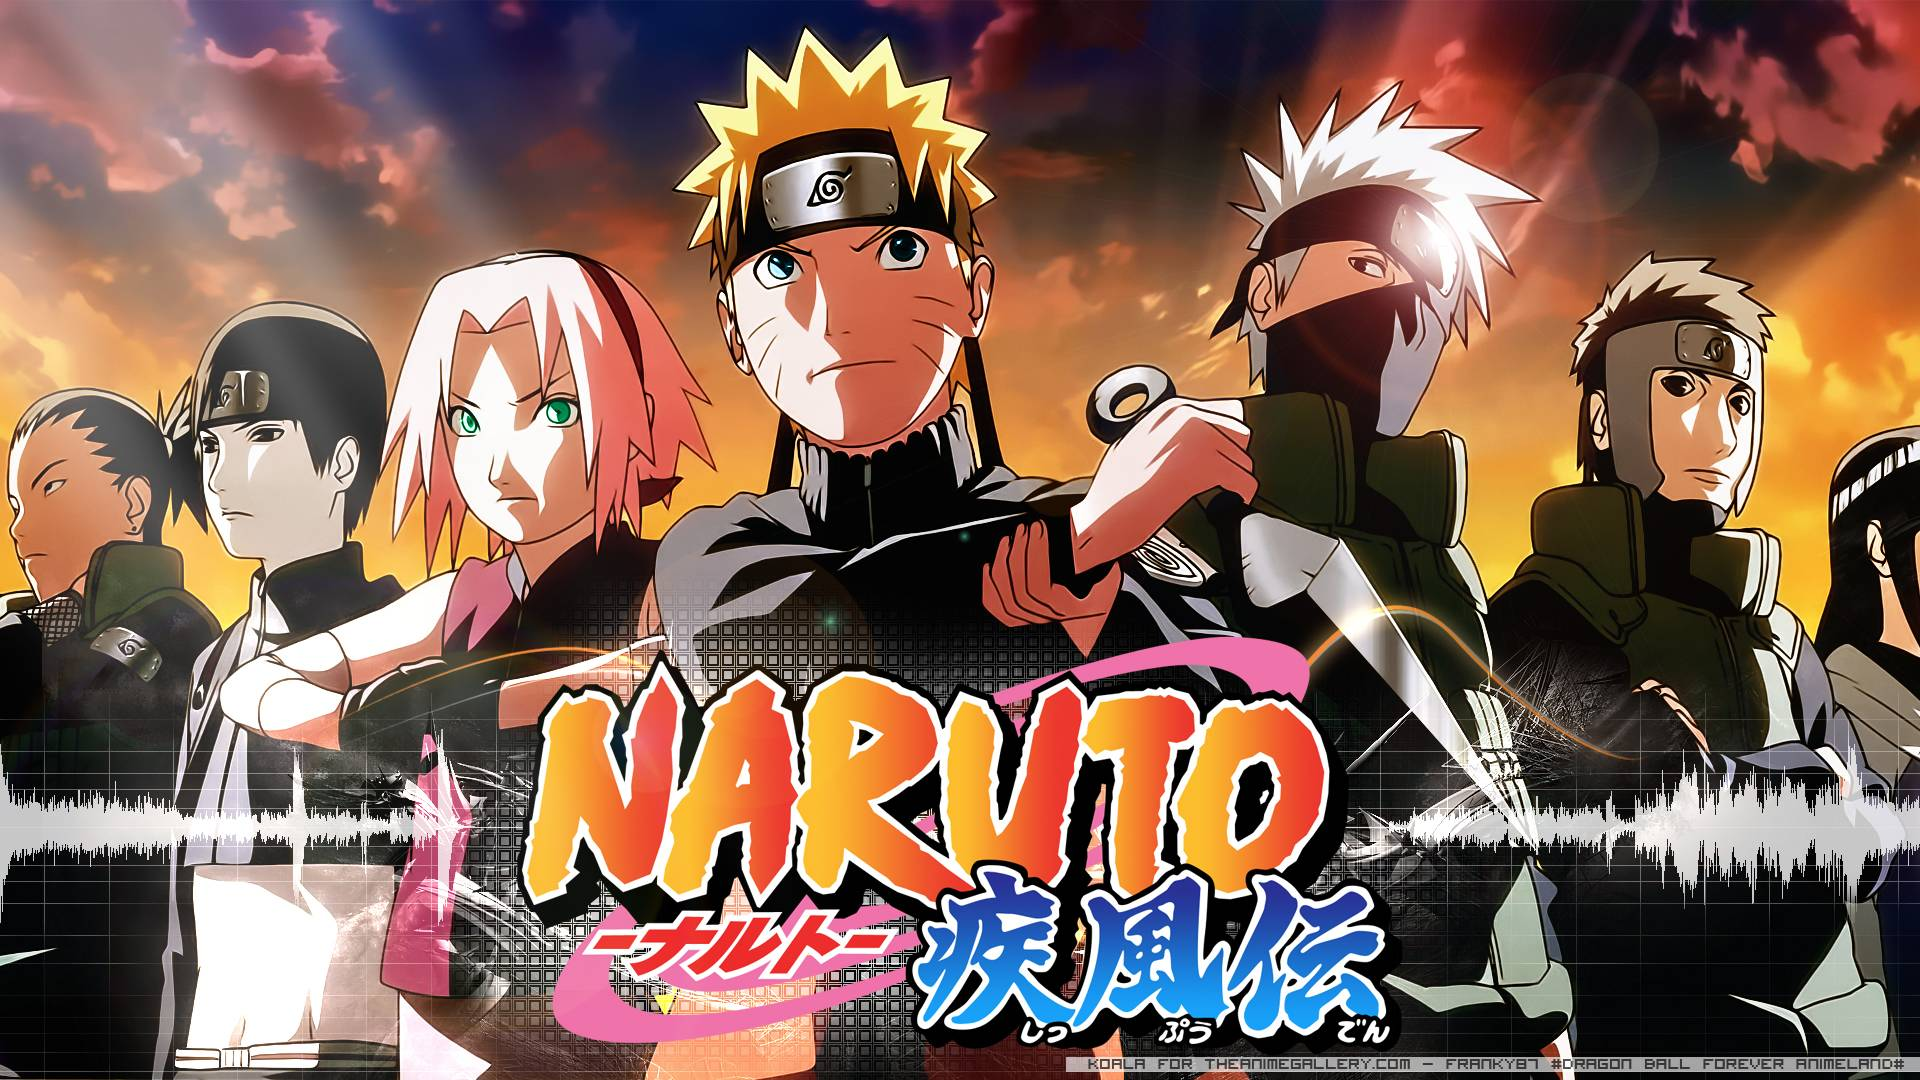 Top Wallpaper Naruto Cartoon - roLXPH2  Photograph_297261.jpg